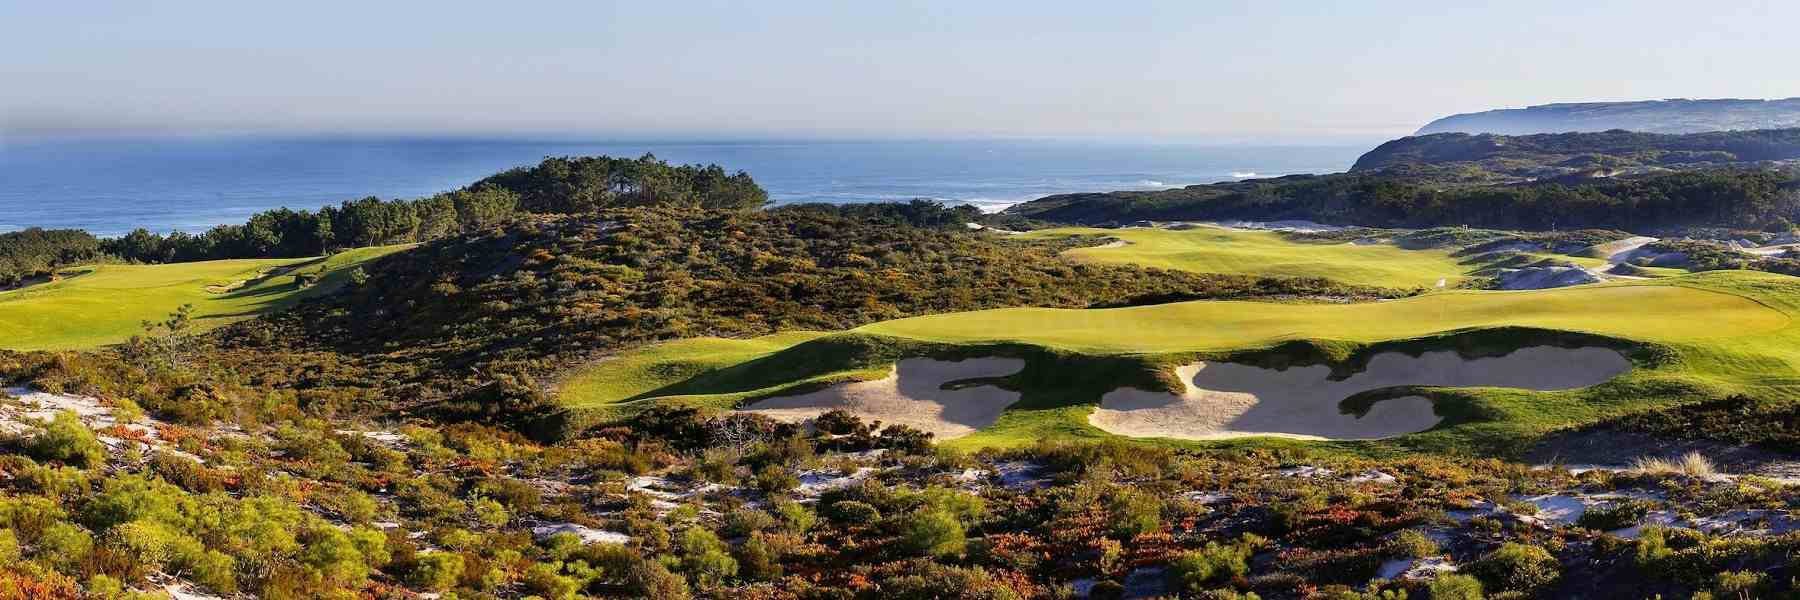 Westcliffs links no resort Praia del Rey